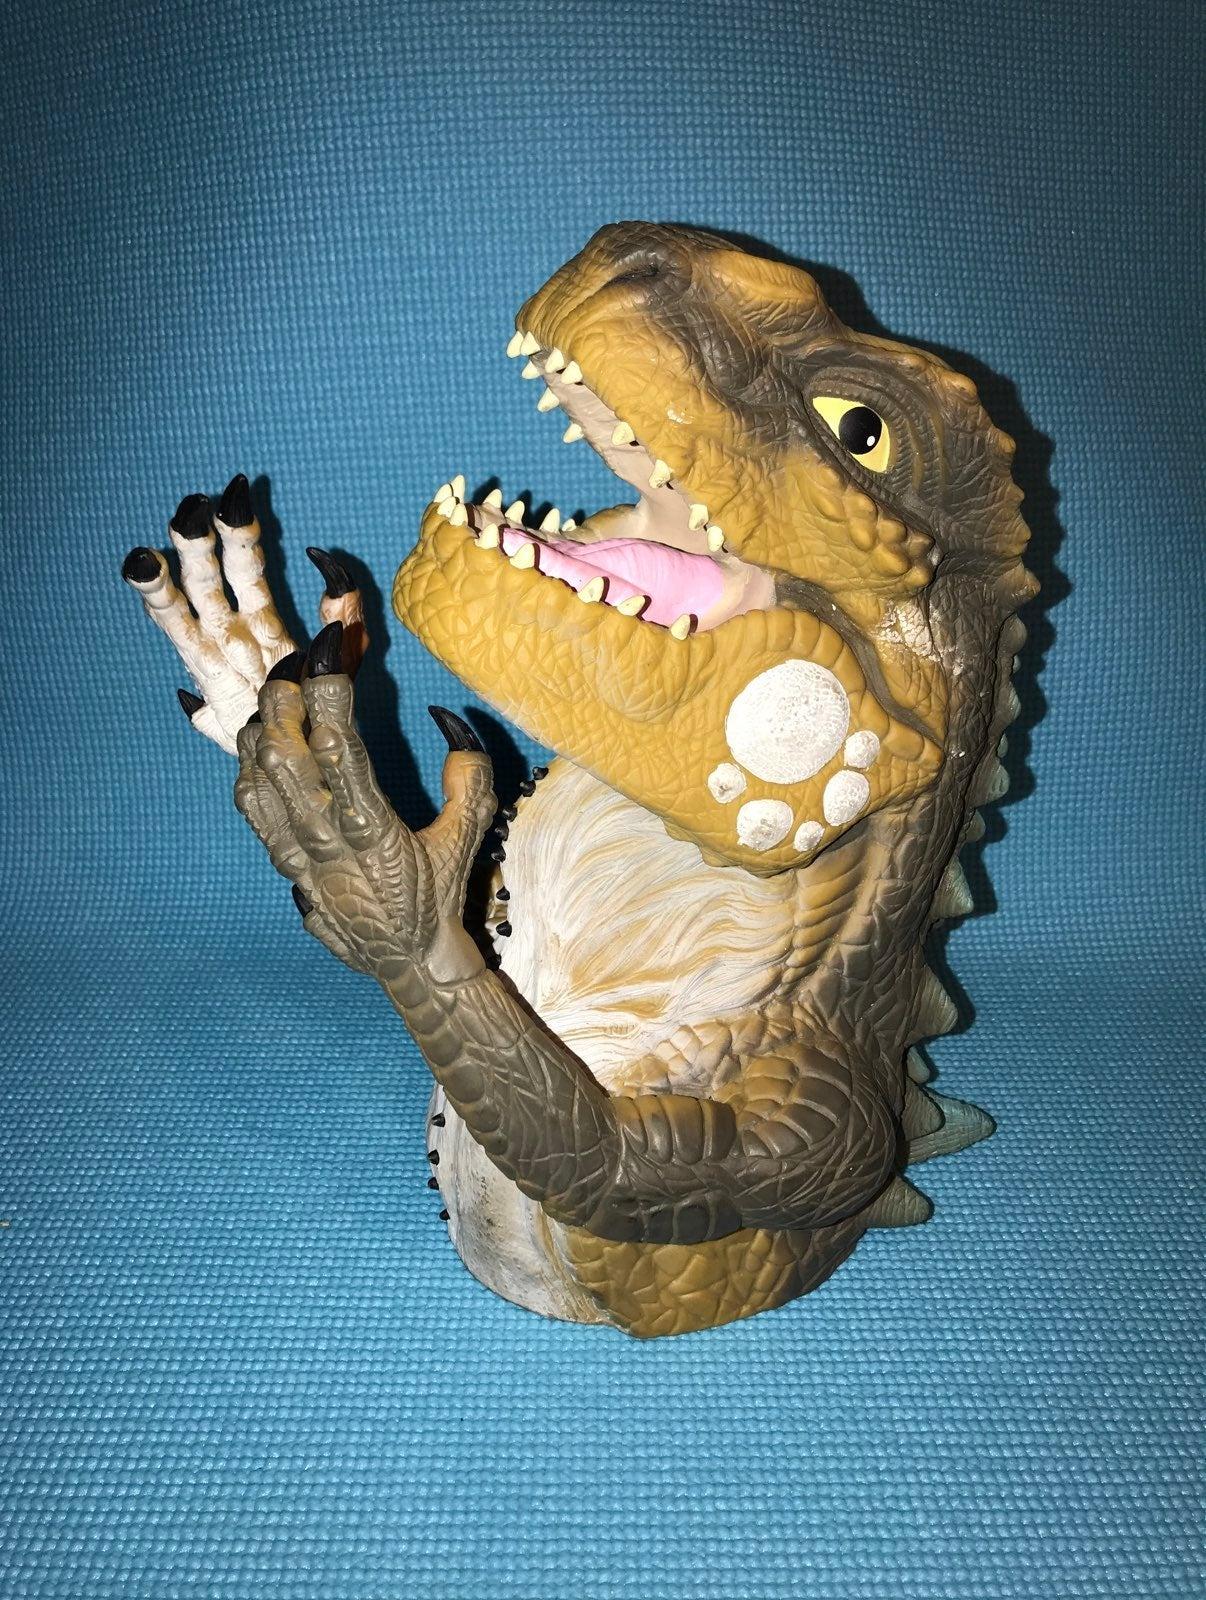 Rare vintage 1998 Baby Godzilla Puppet